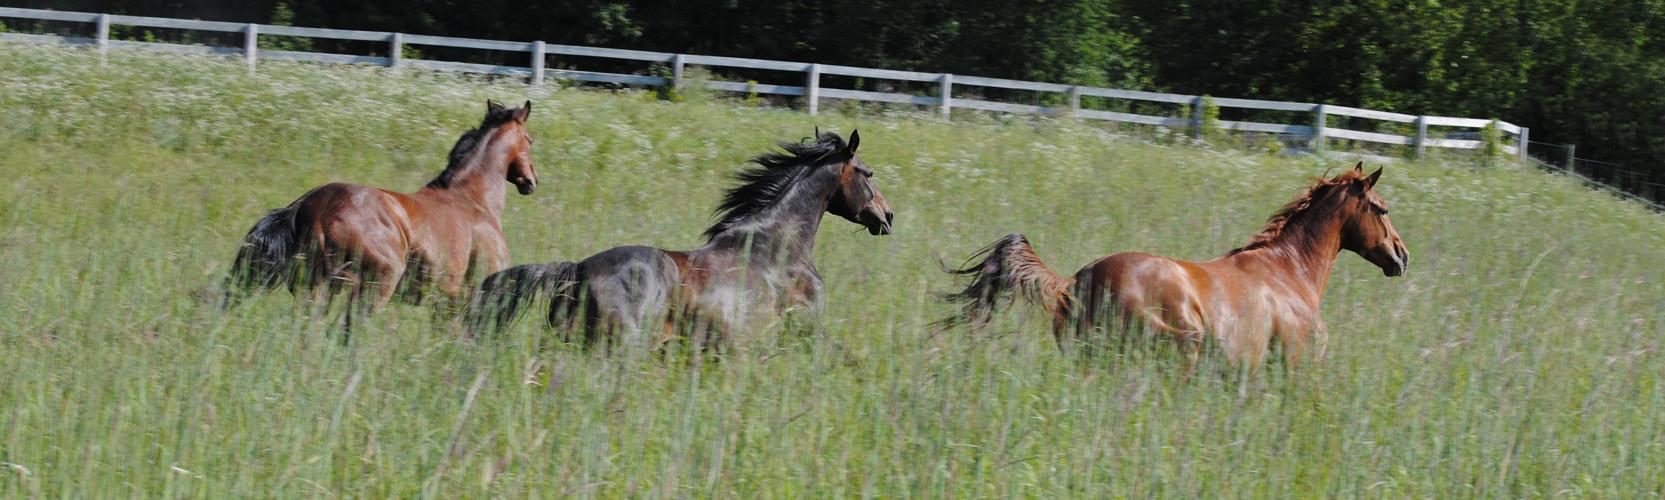 Hollys 3 Horses